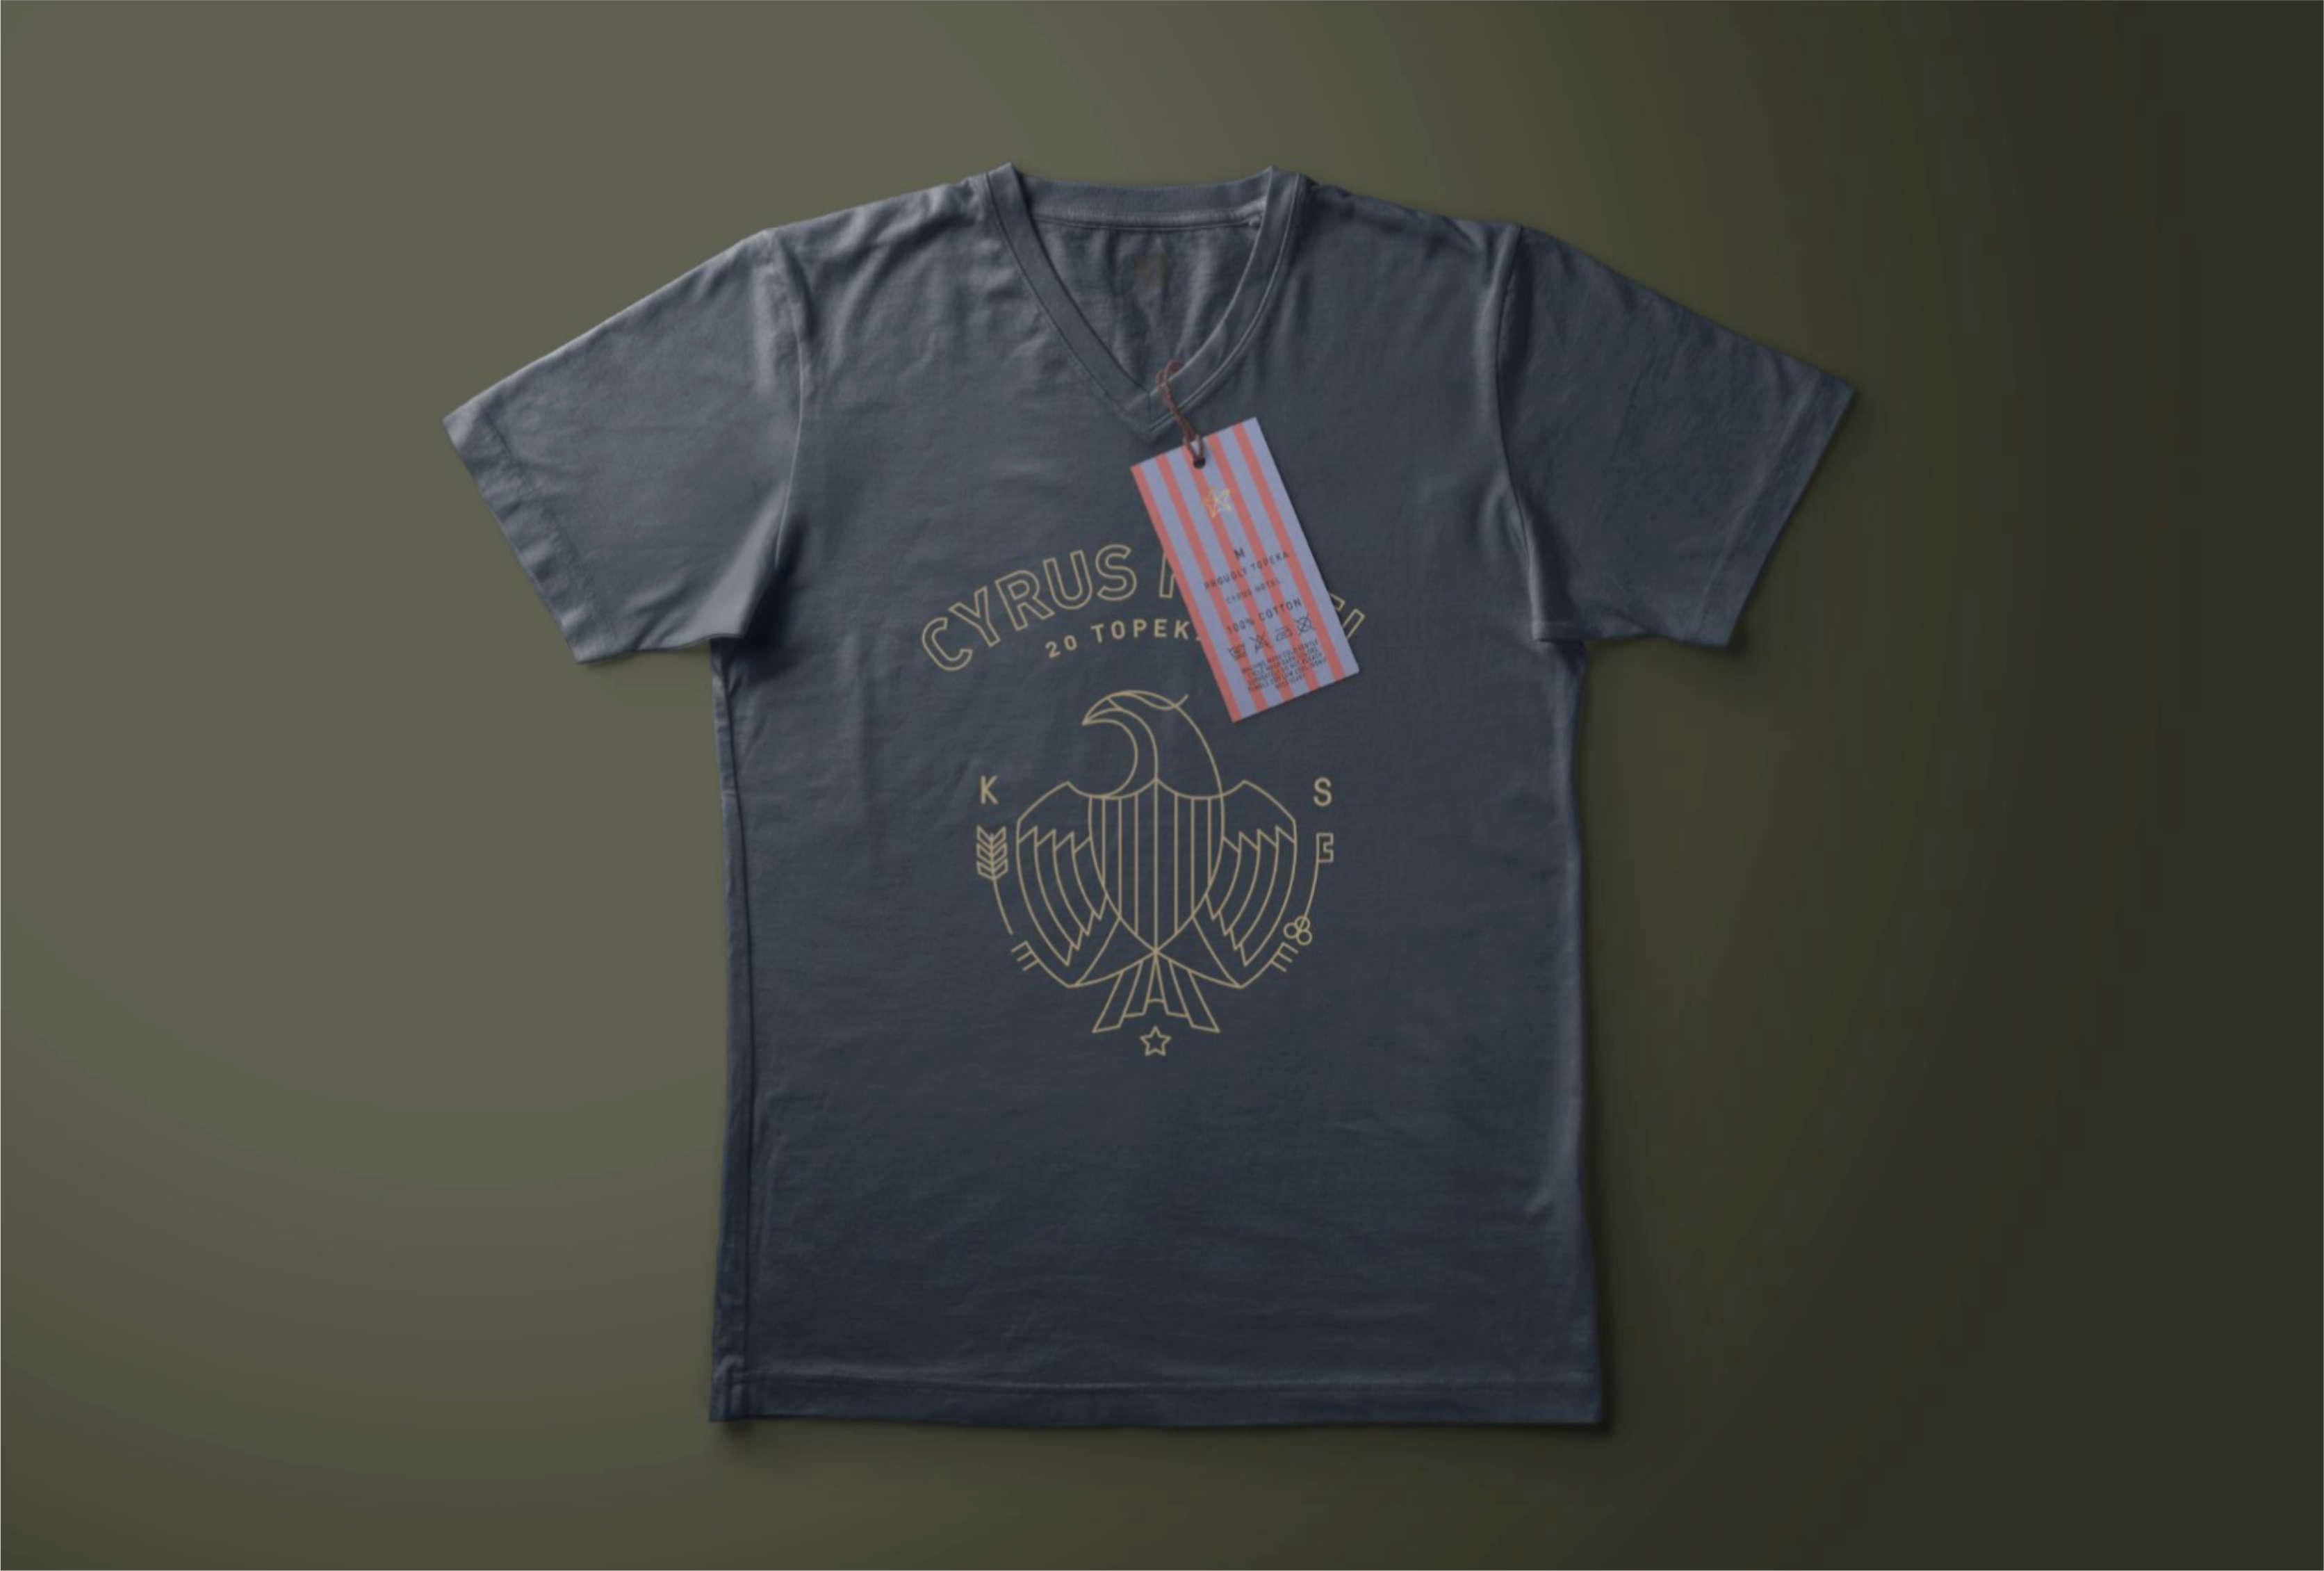 Cyrus Hotel t-shirt design.